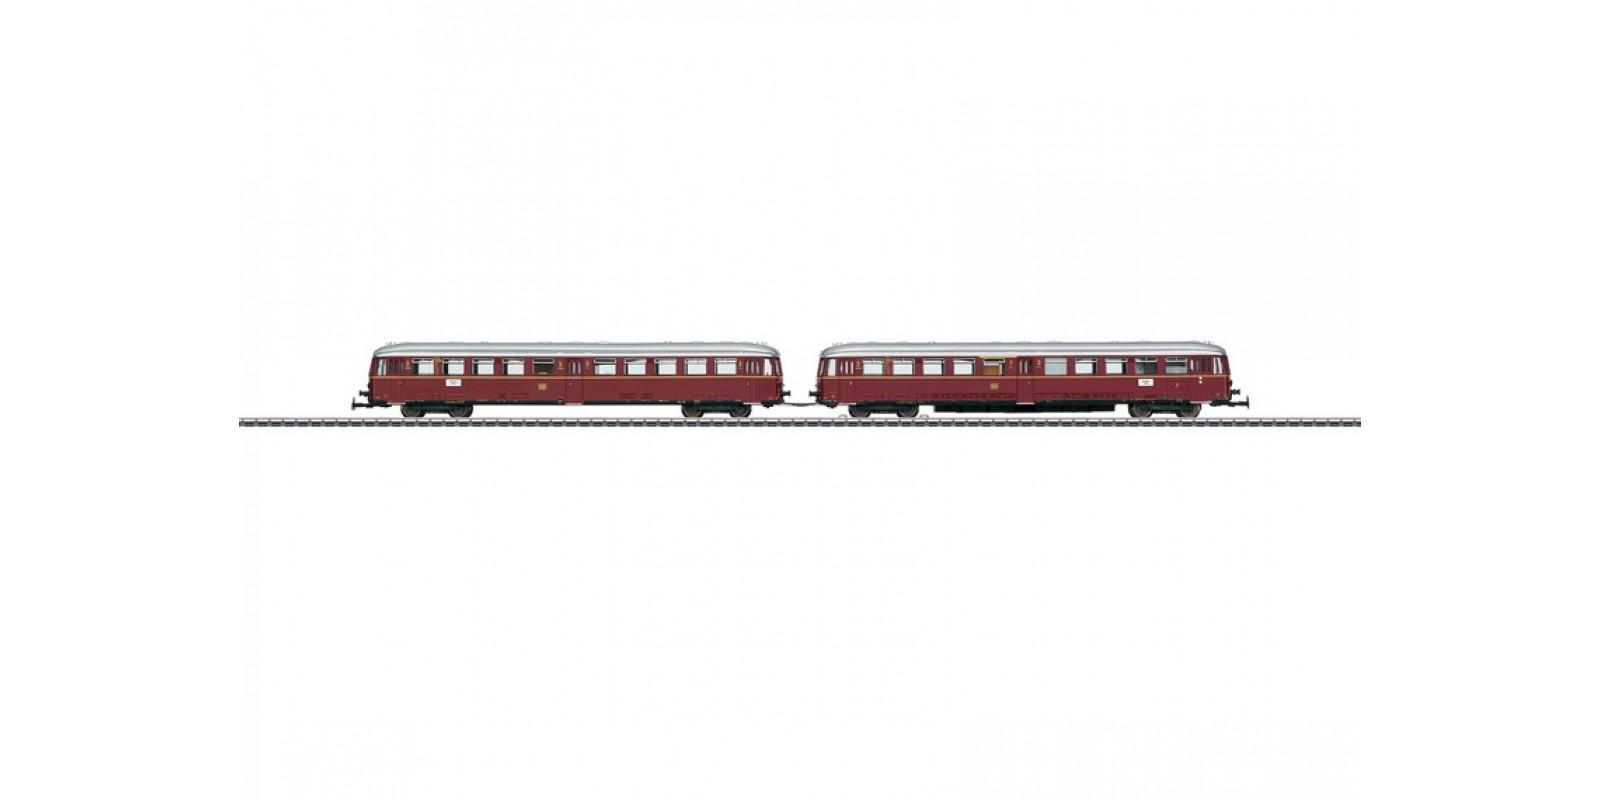 30760 Class ETA 150 Battery-Powered Rail Car with a Class ESA 150 Control Car